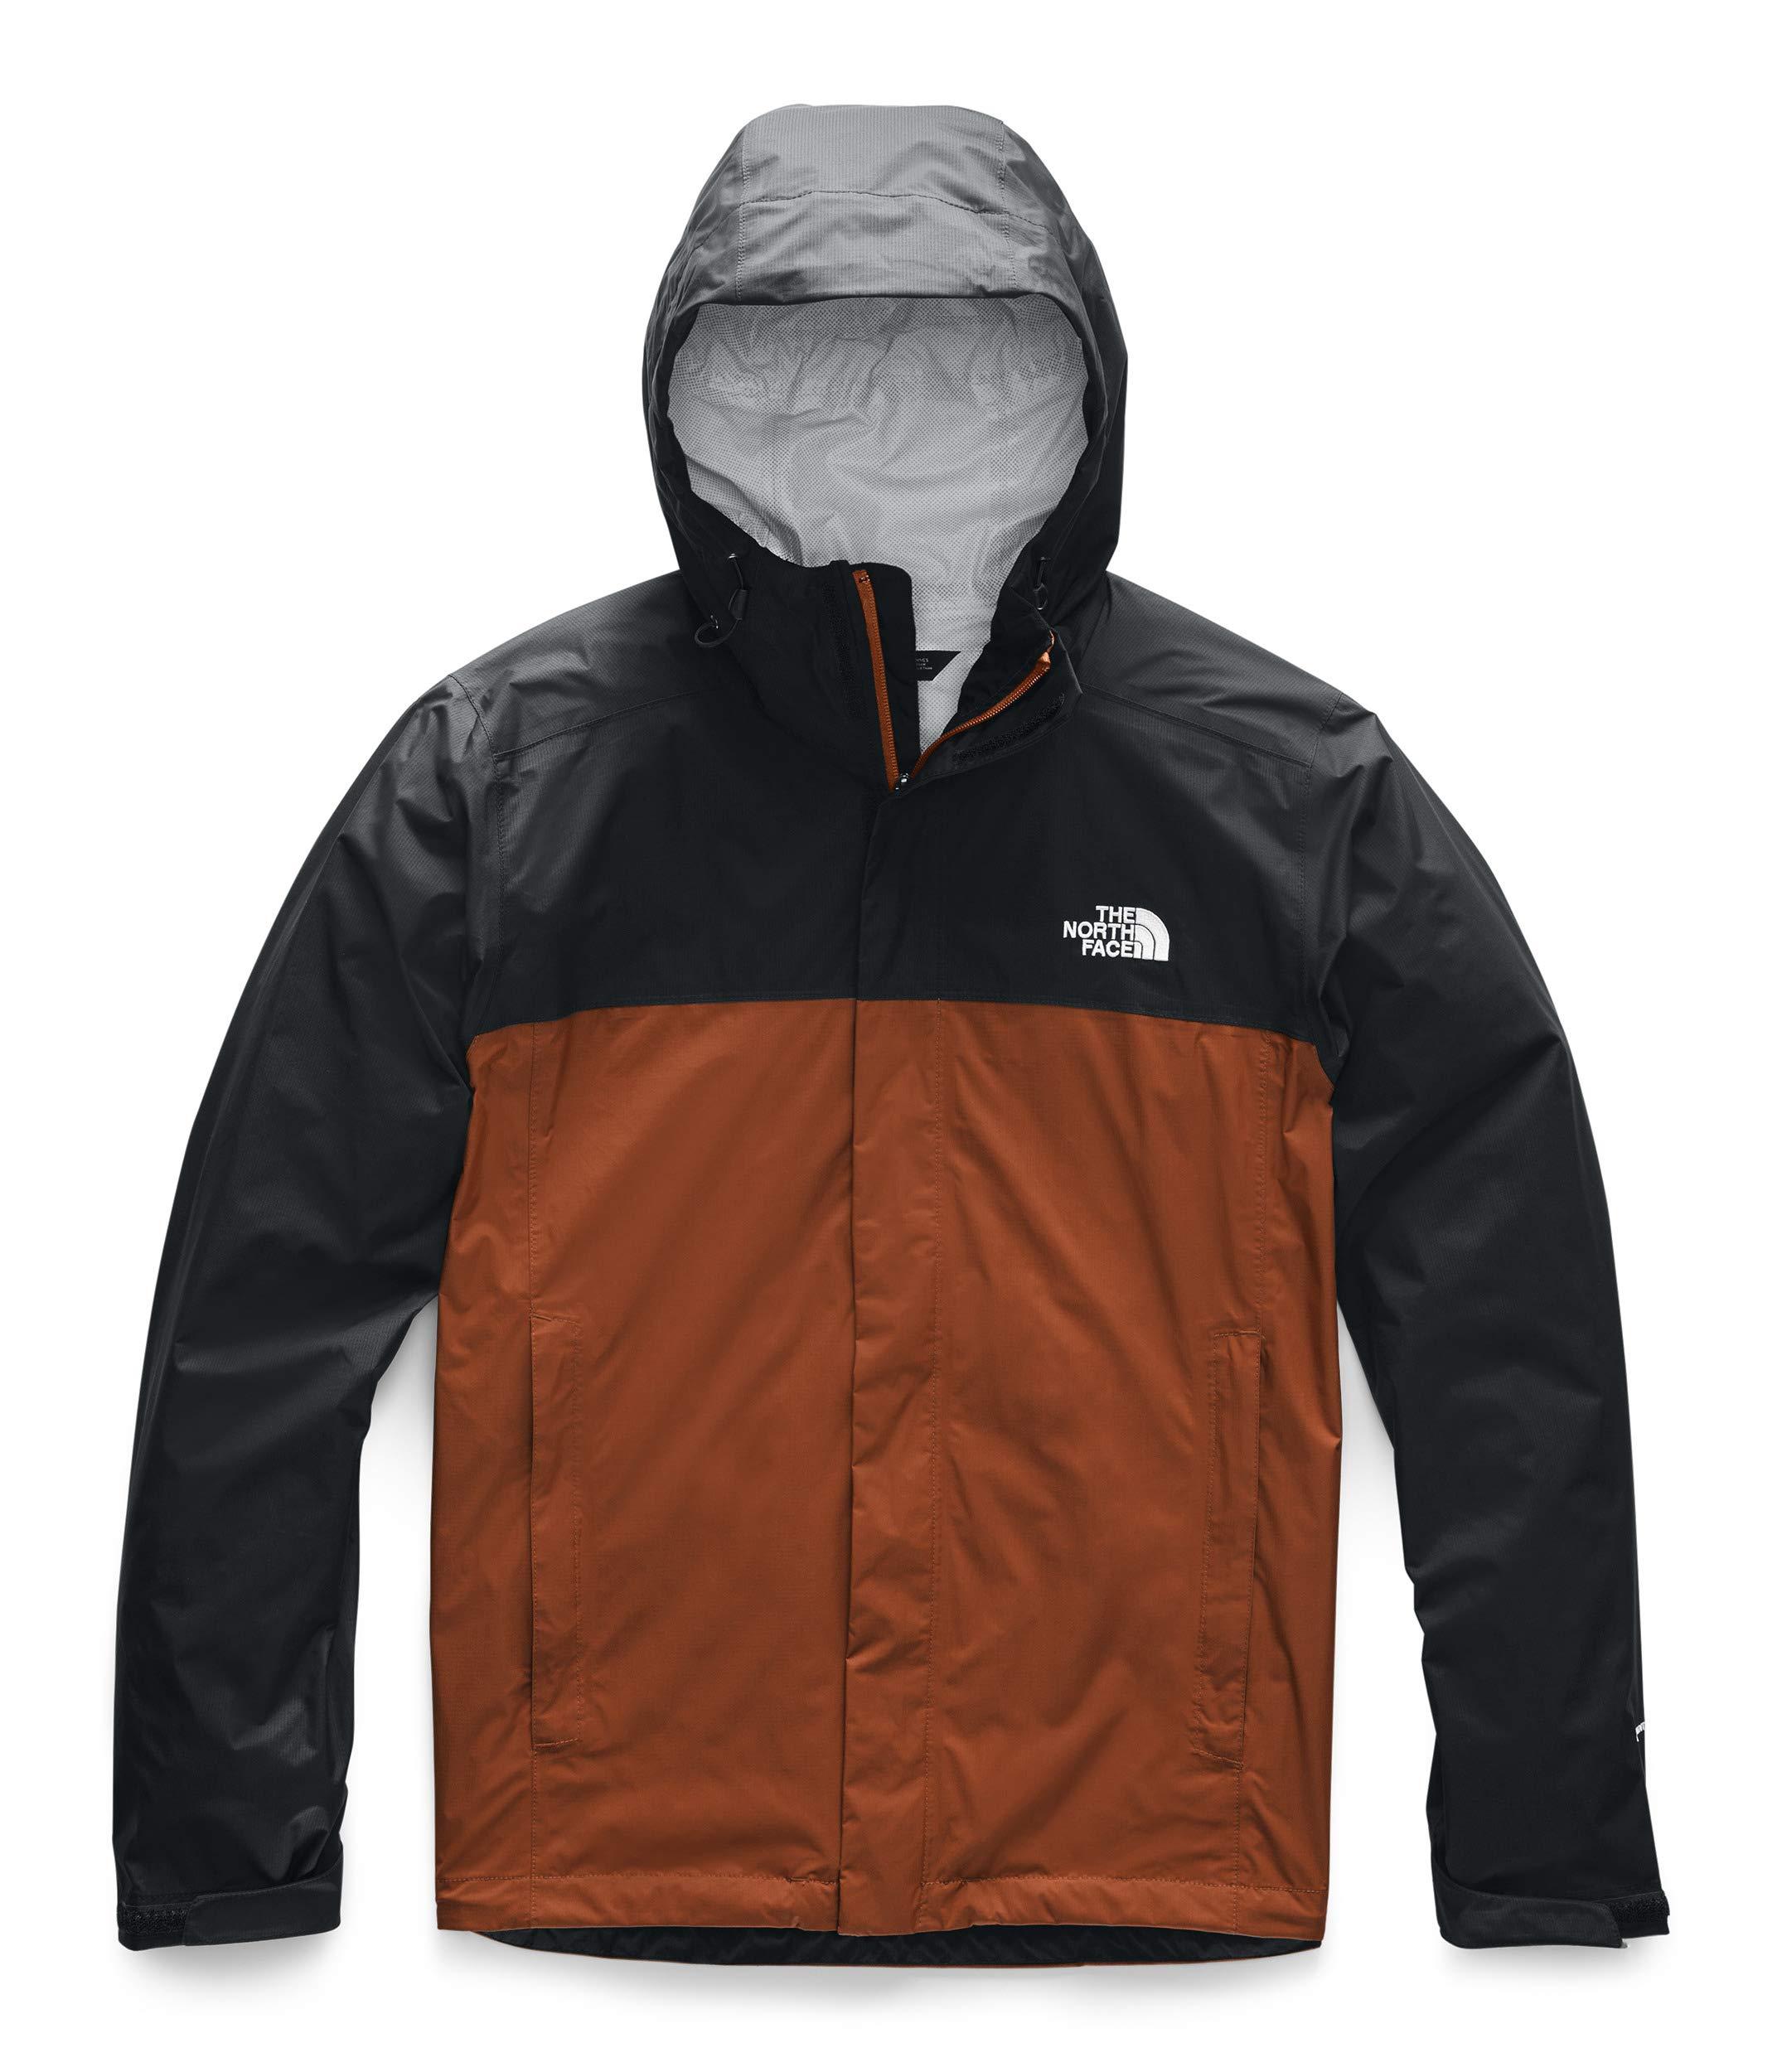 The North Face Men's Venture 2 Jacket, Picante Red/TNF Black, L